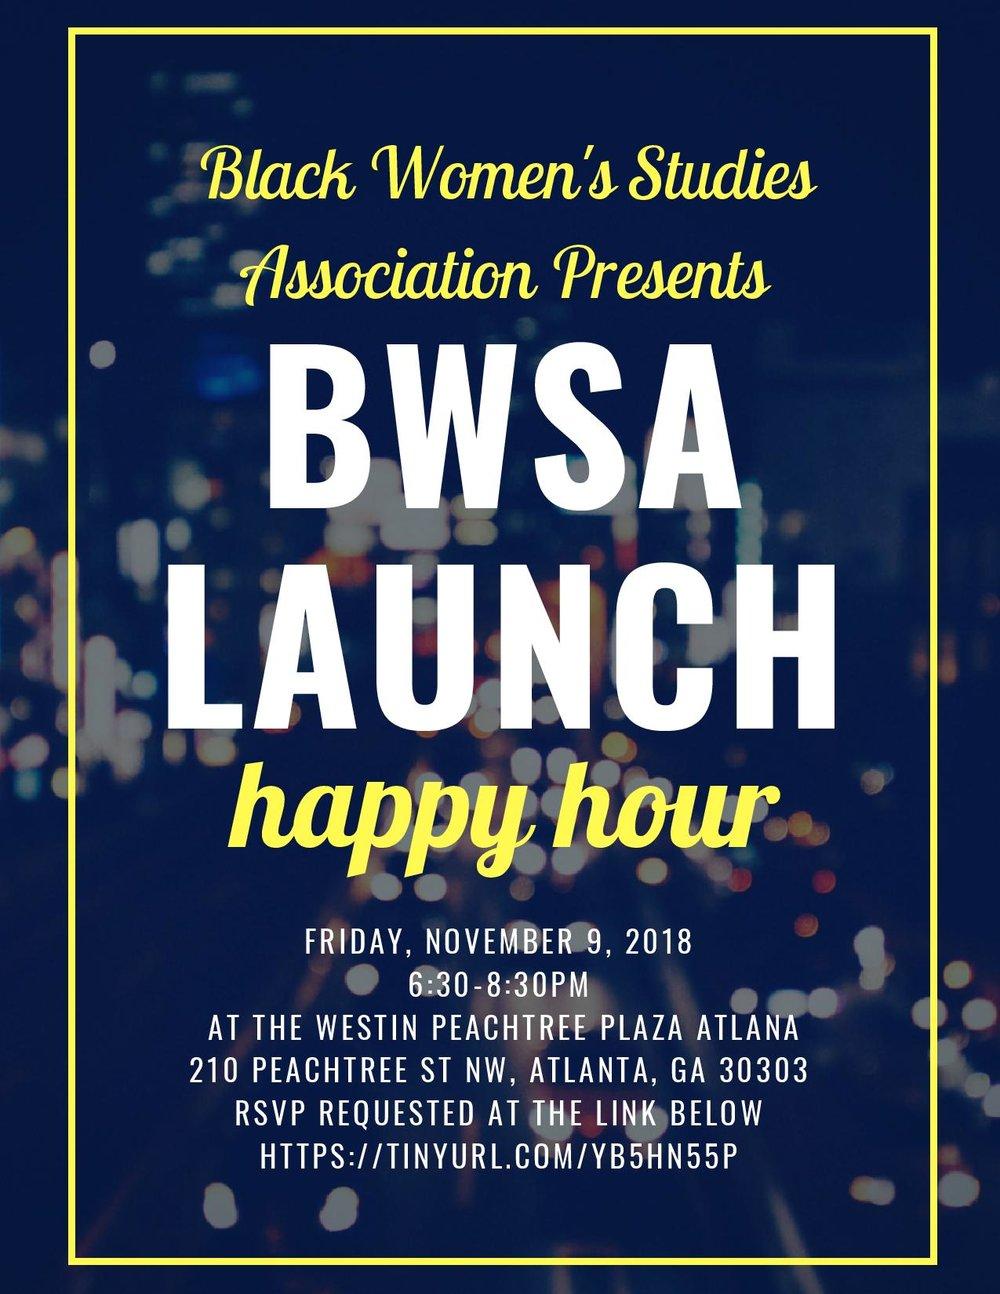 BWSA Launch Flyer.jpg